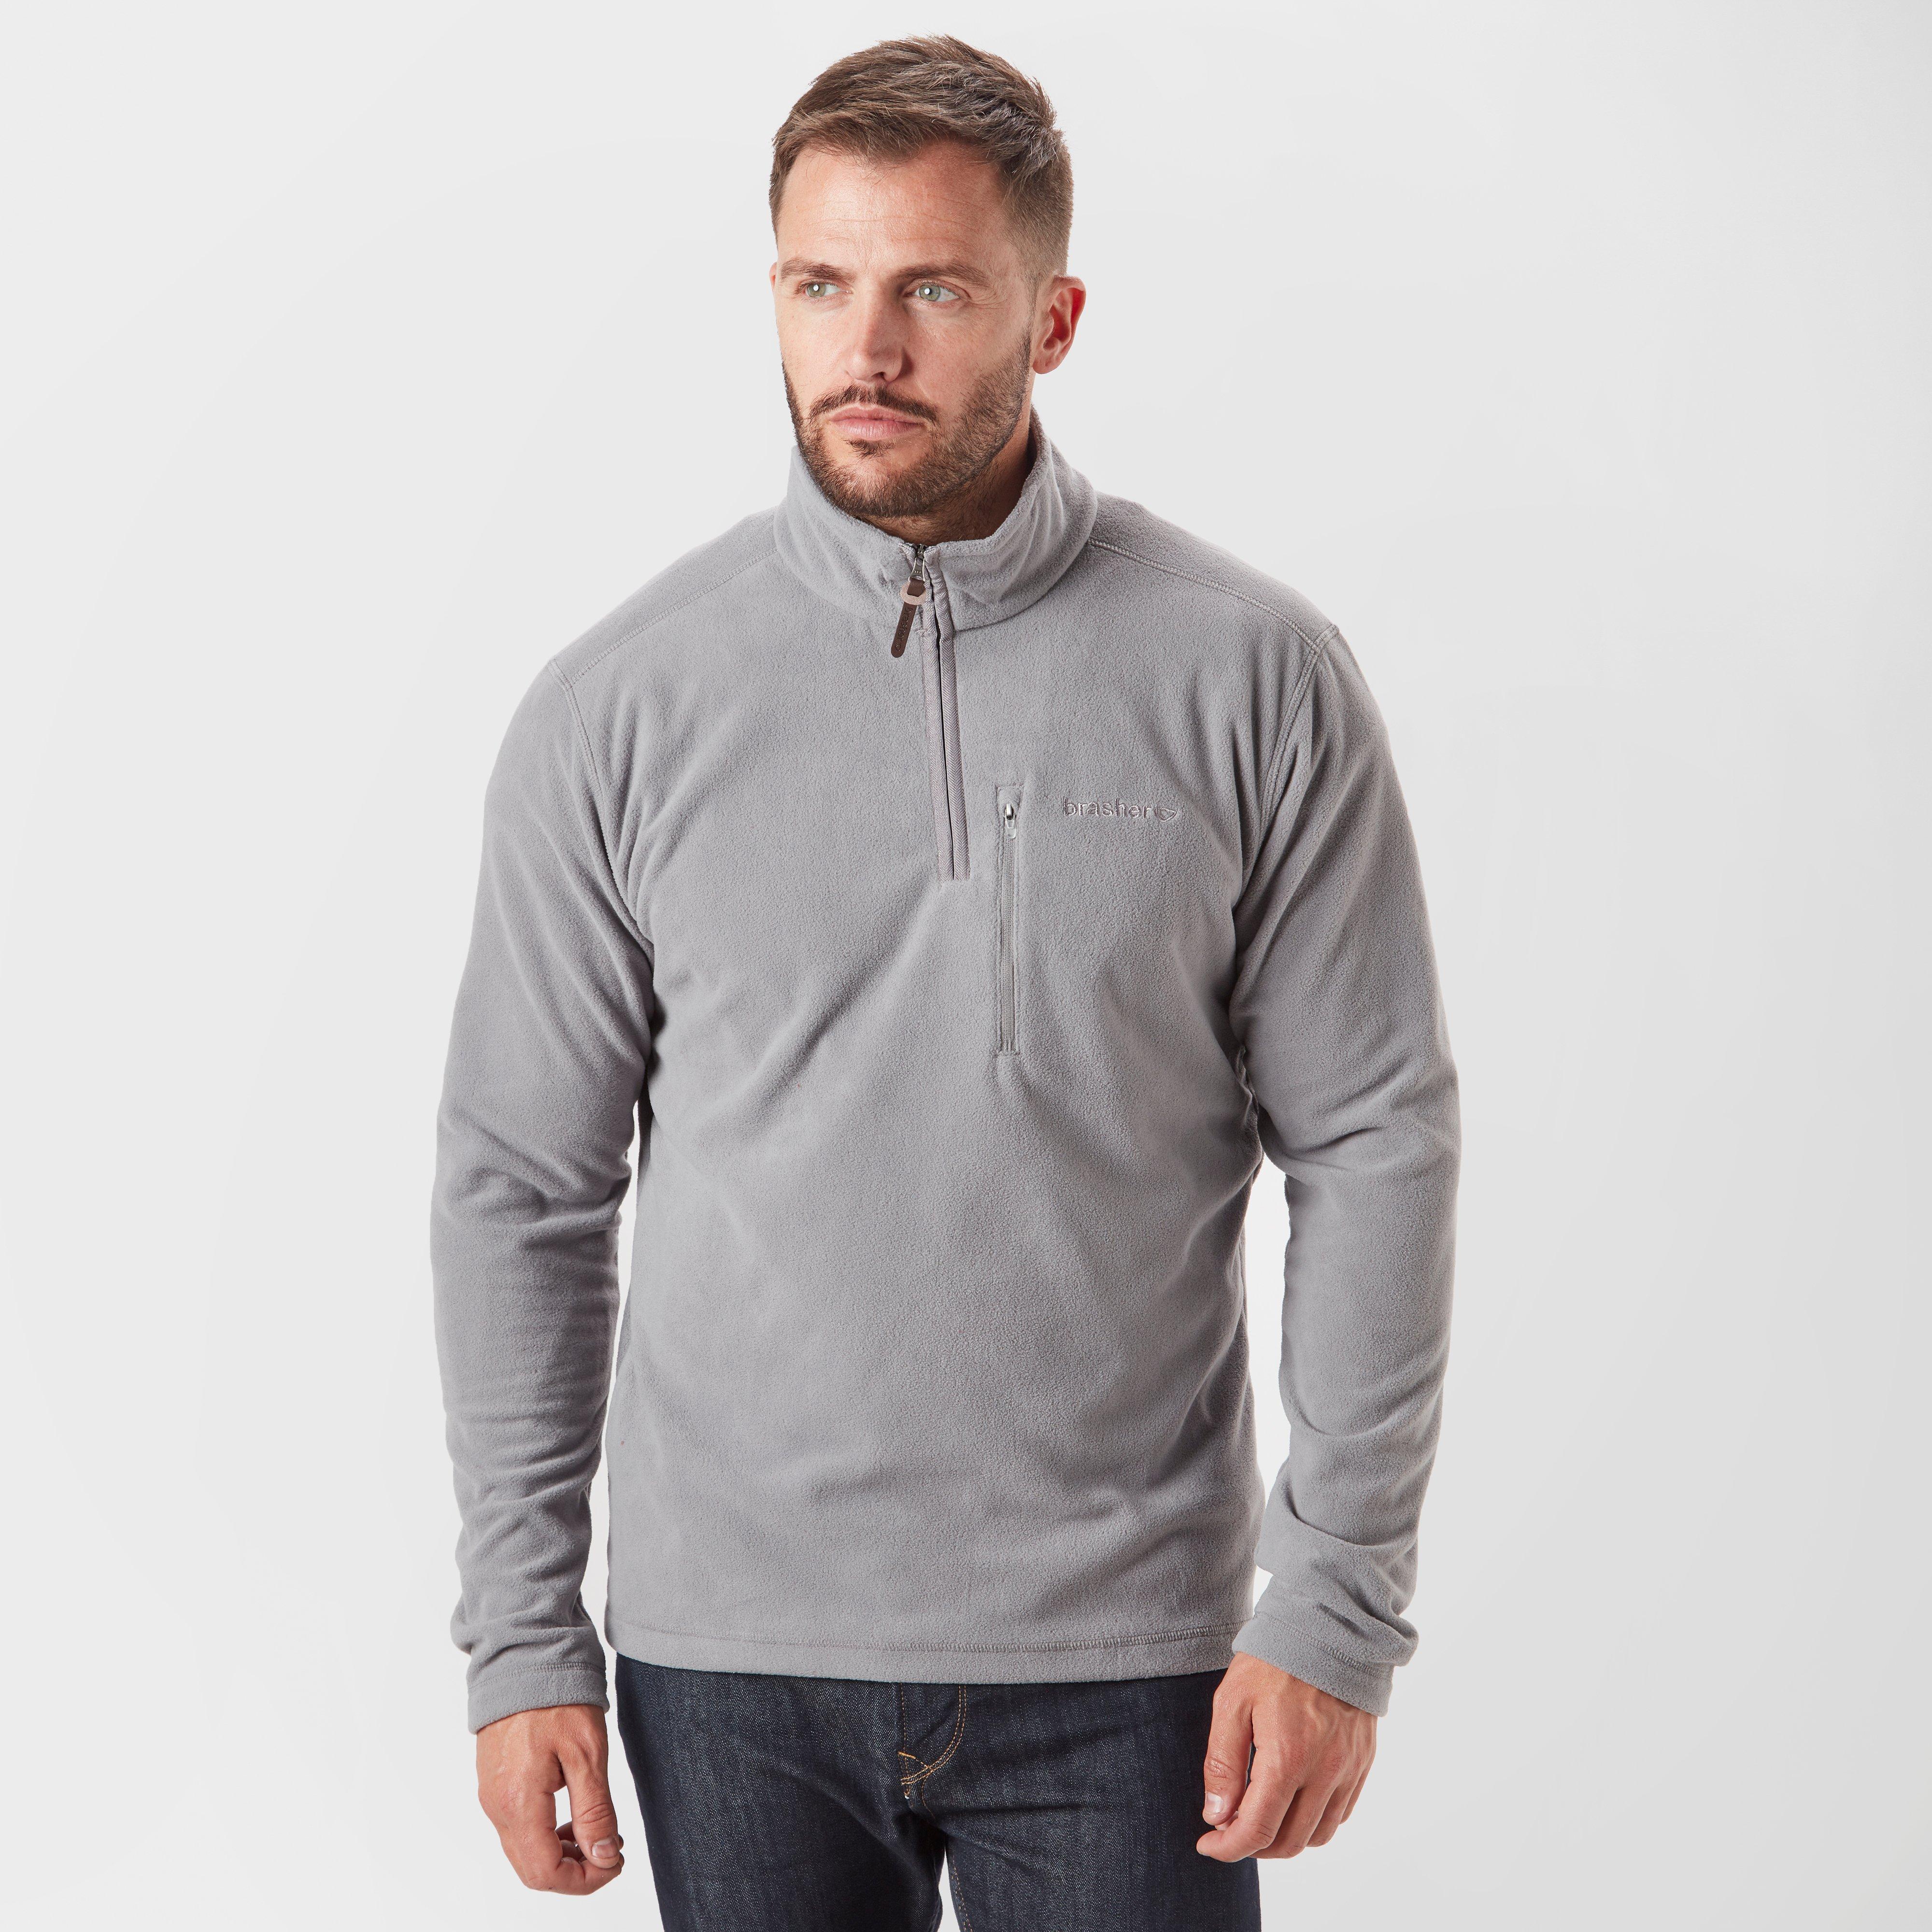 Brasher Mens Bleaberry Half-zip Fleece - Grey/mgy  Grey/mgy